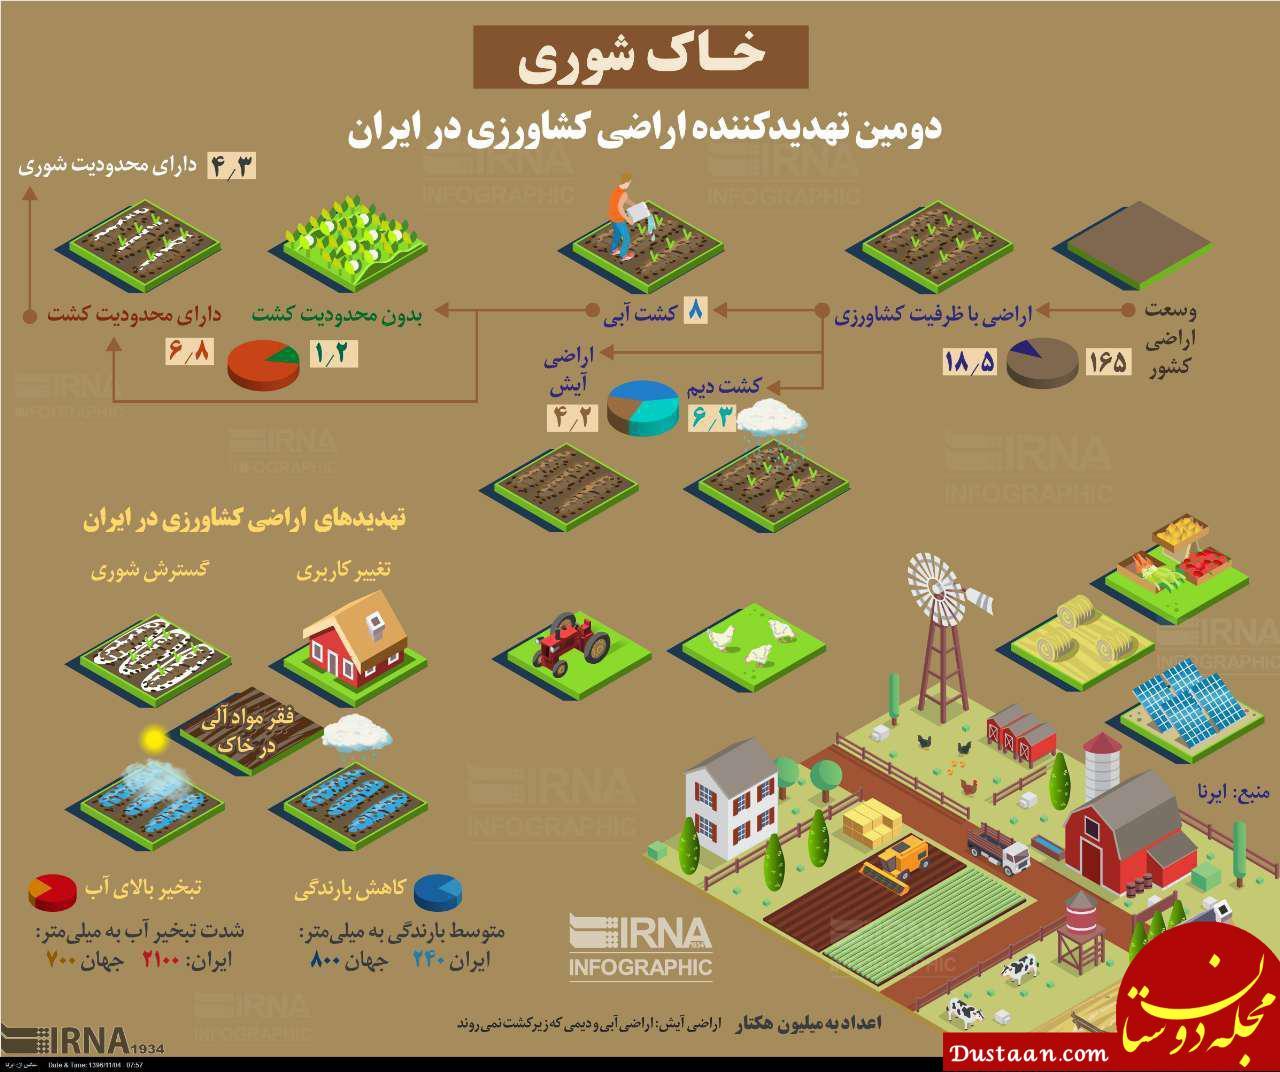 www.dustaan.com «خاک شوری» دومین تهدیدکننده اراضی کشاورزی در ایران! +اینفوگرافیک